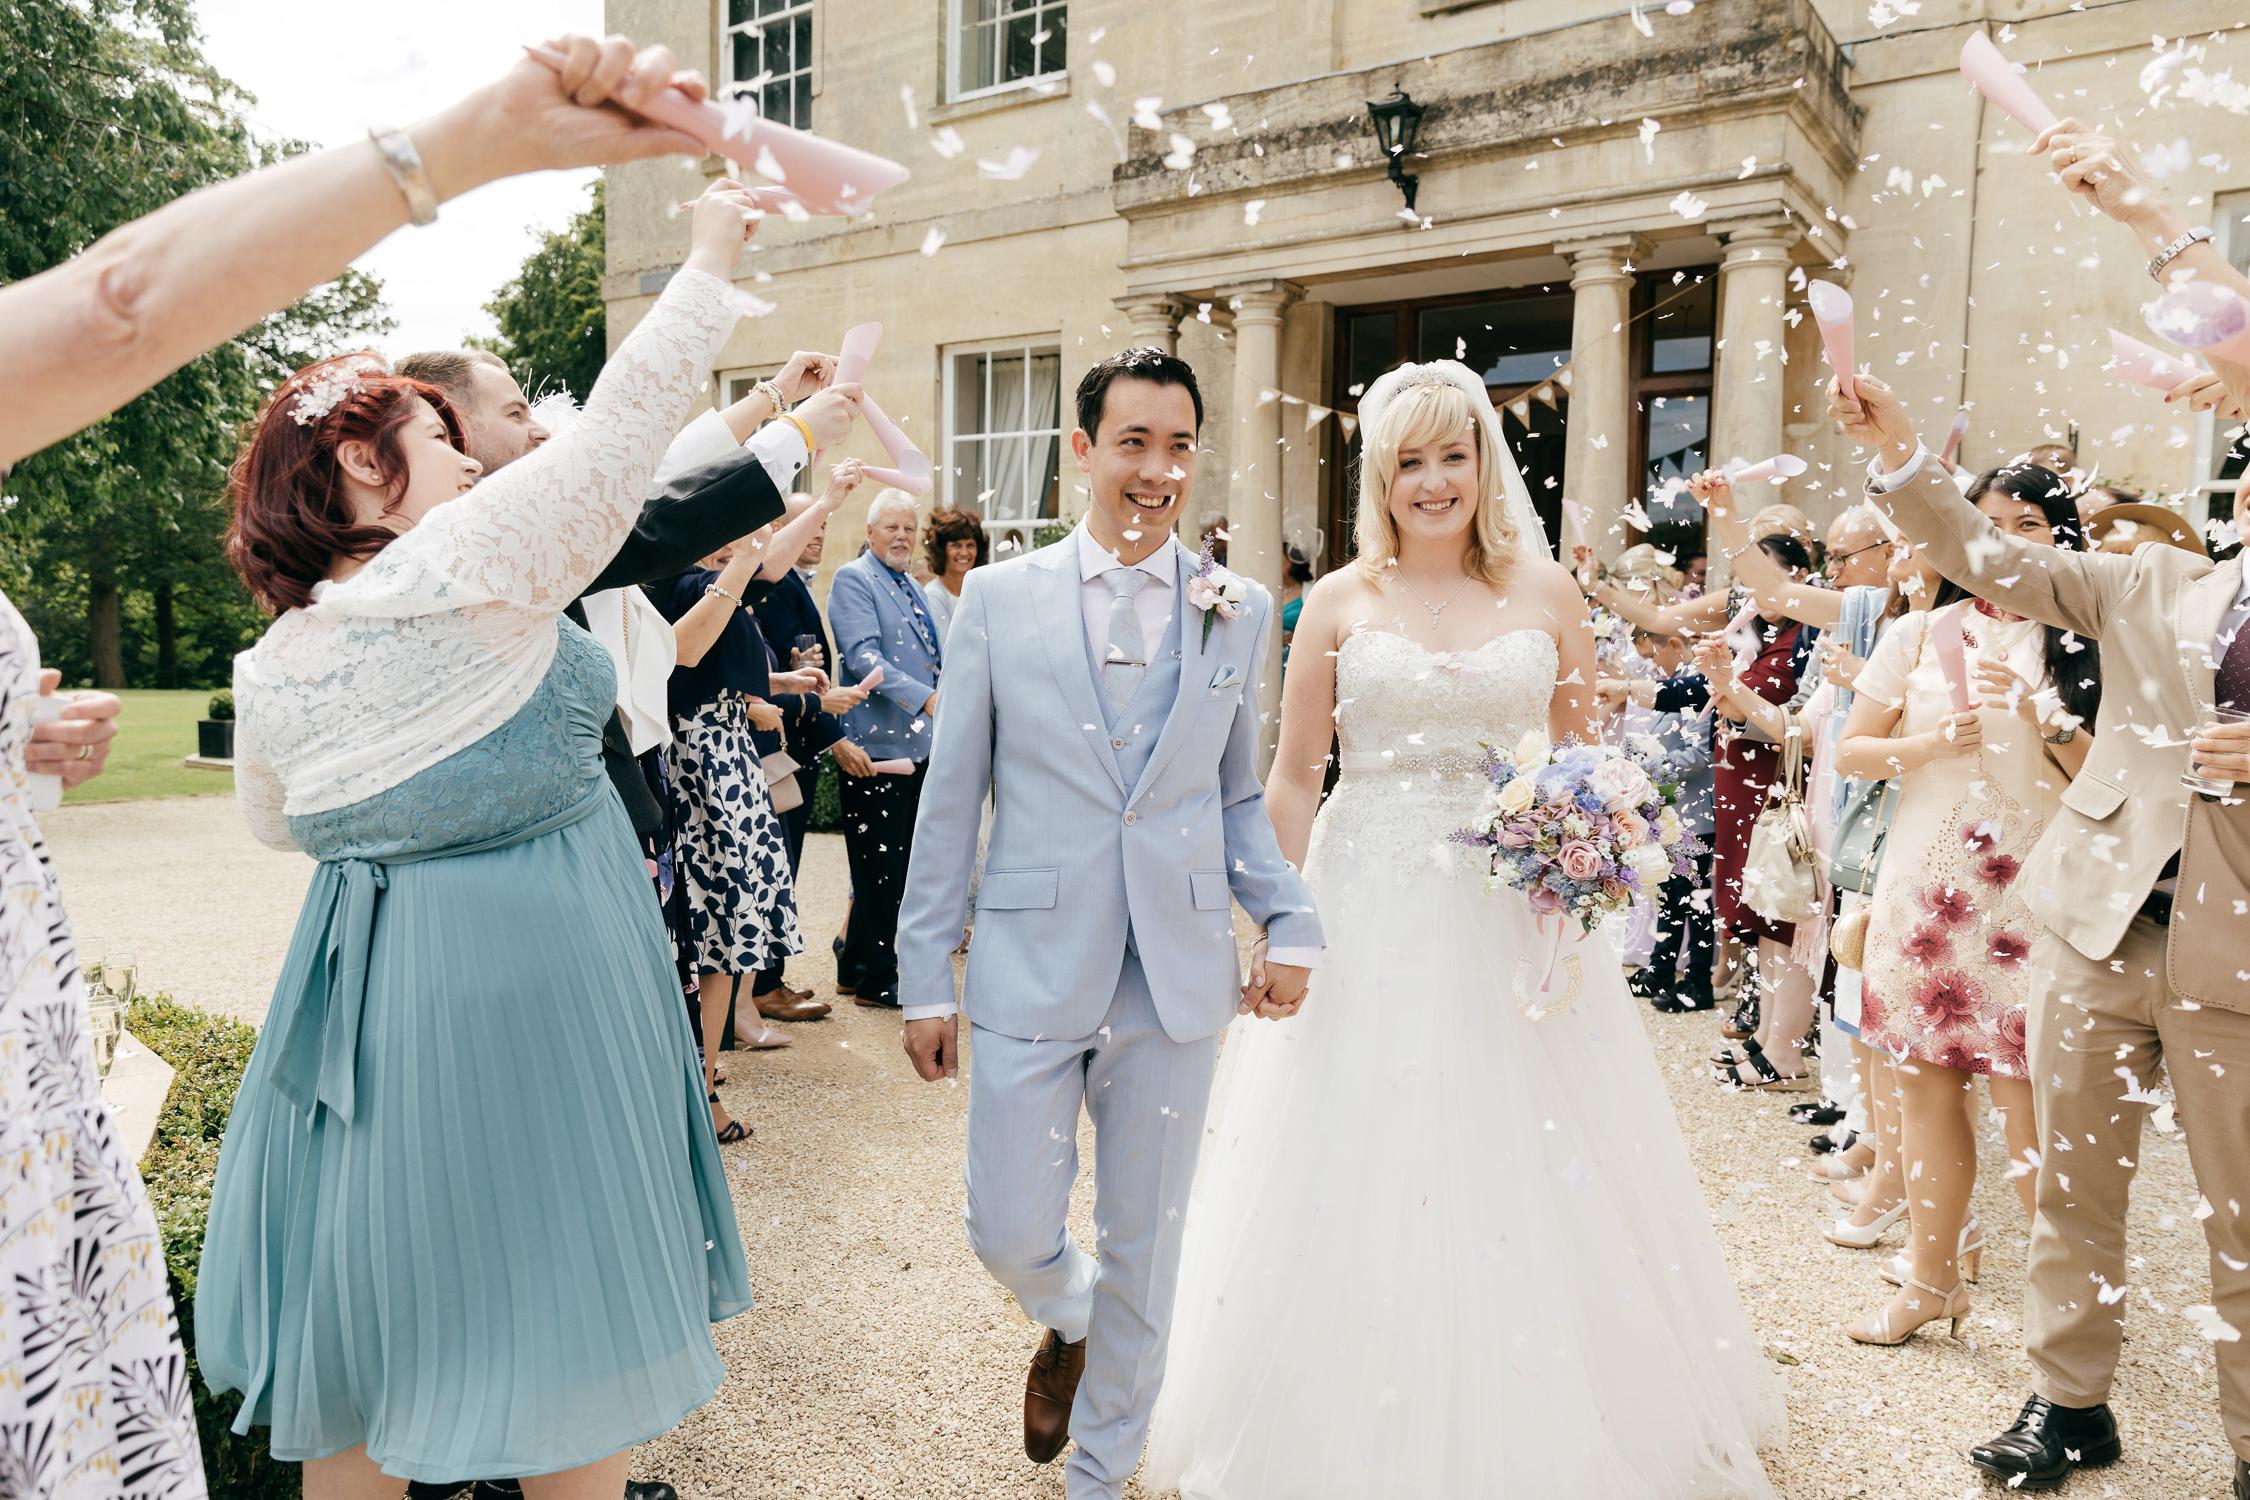 candid photo of joyful couple walking through confetti at pastel themed wedding at eastington park